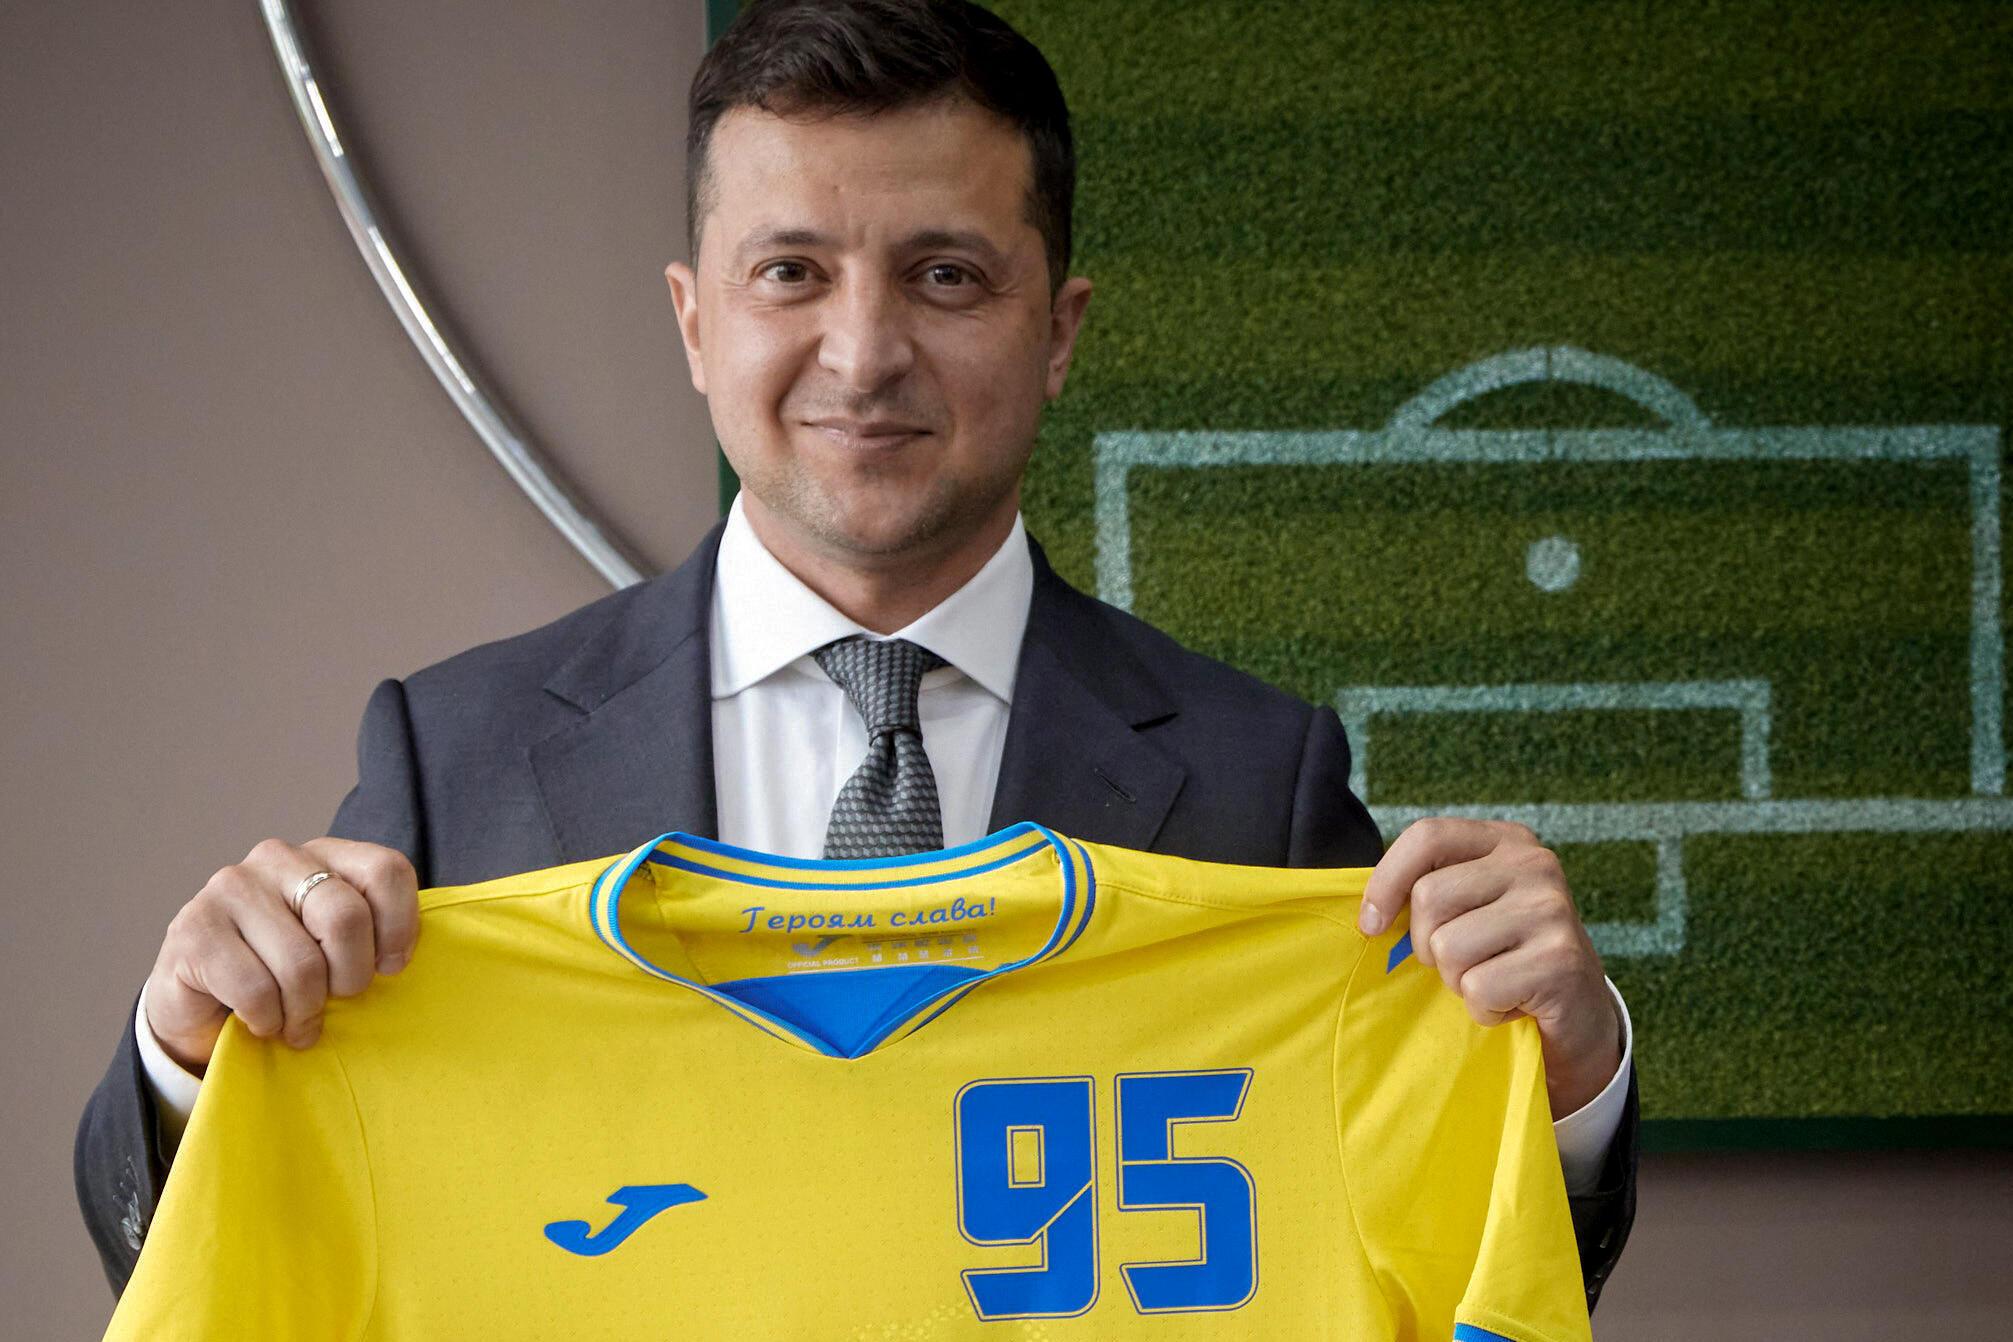 Ukraine football geopolitique